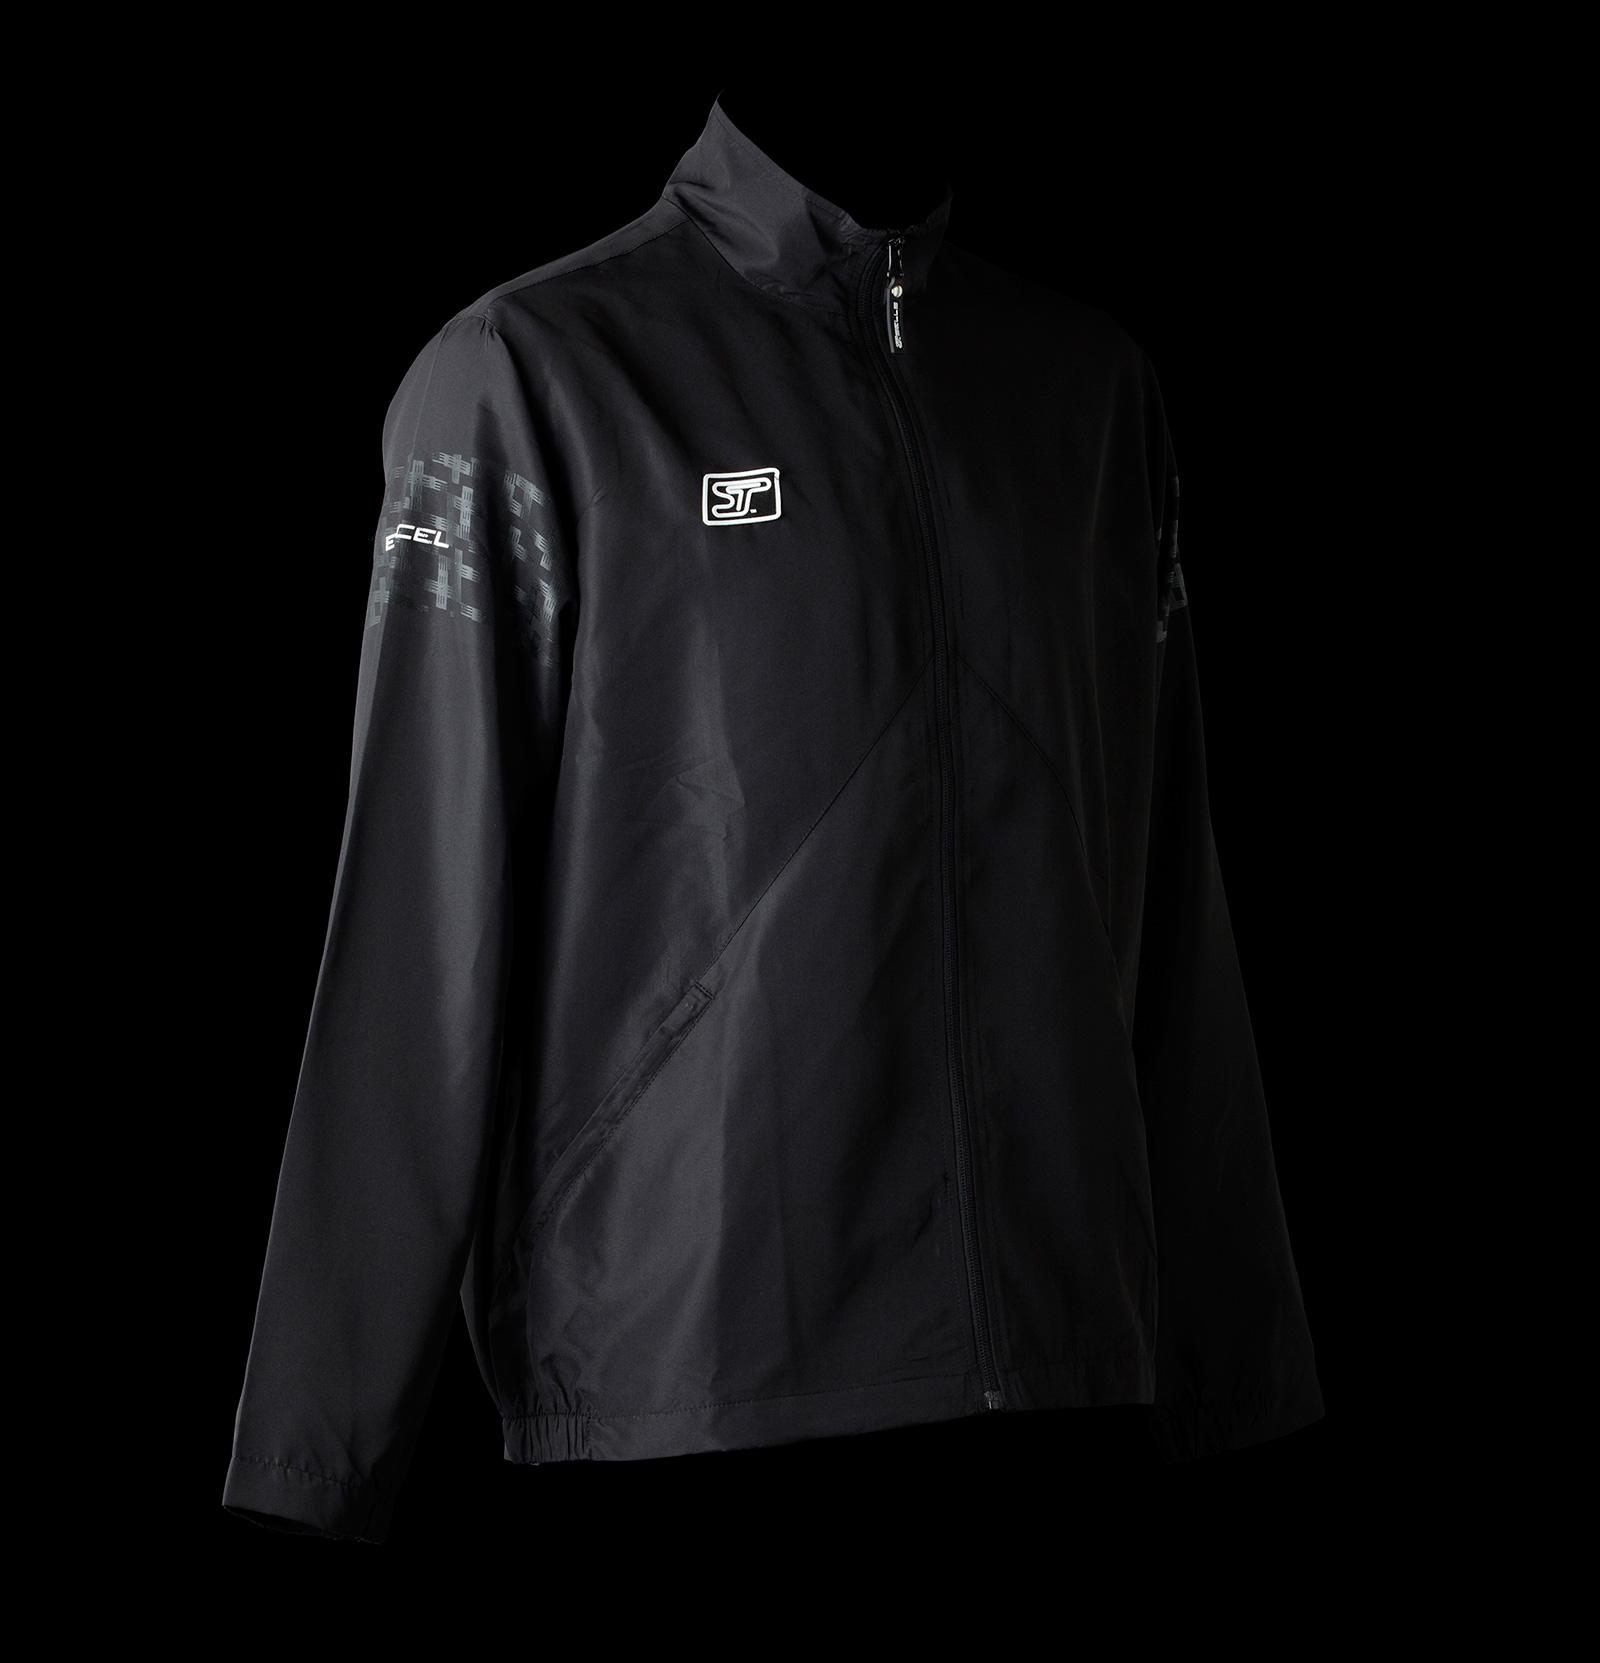 Excel-Travel-Suit-Promo-66